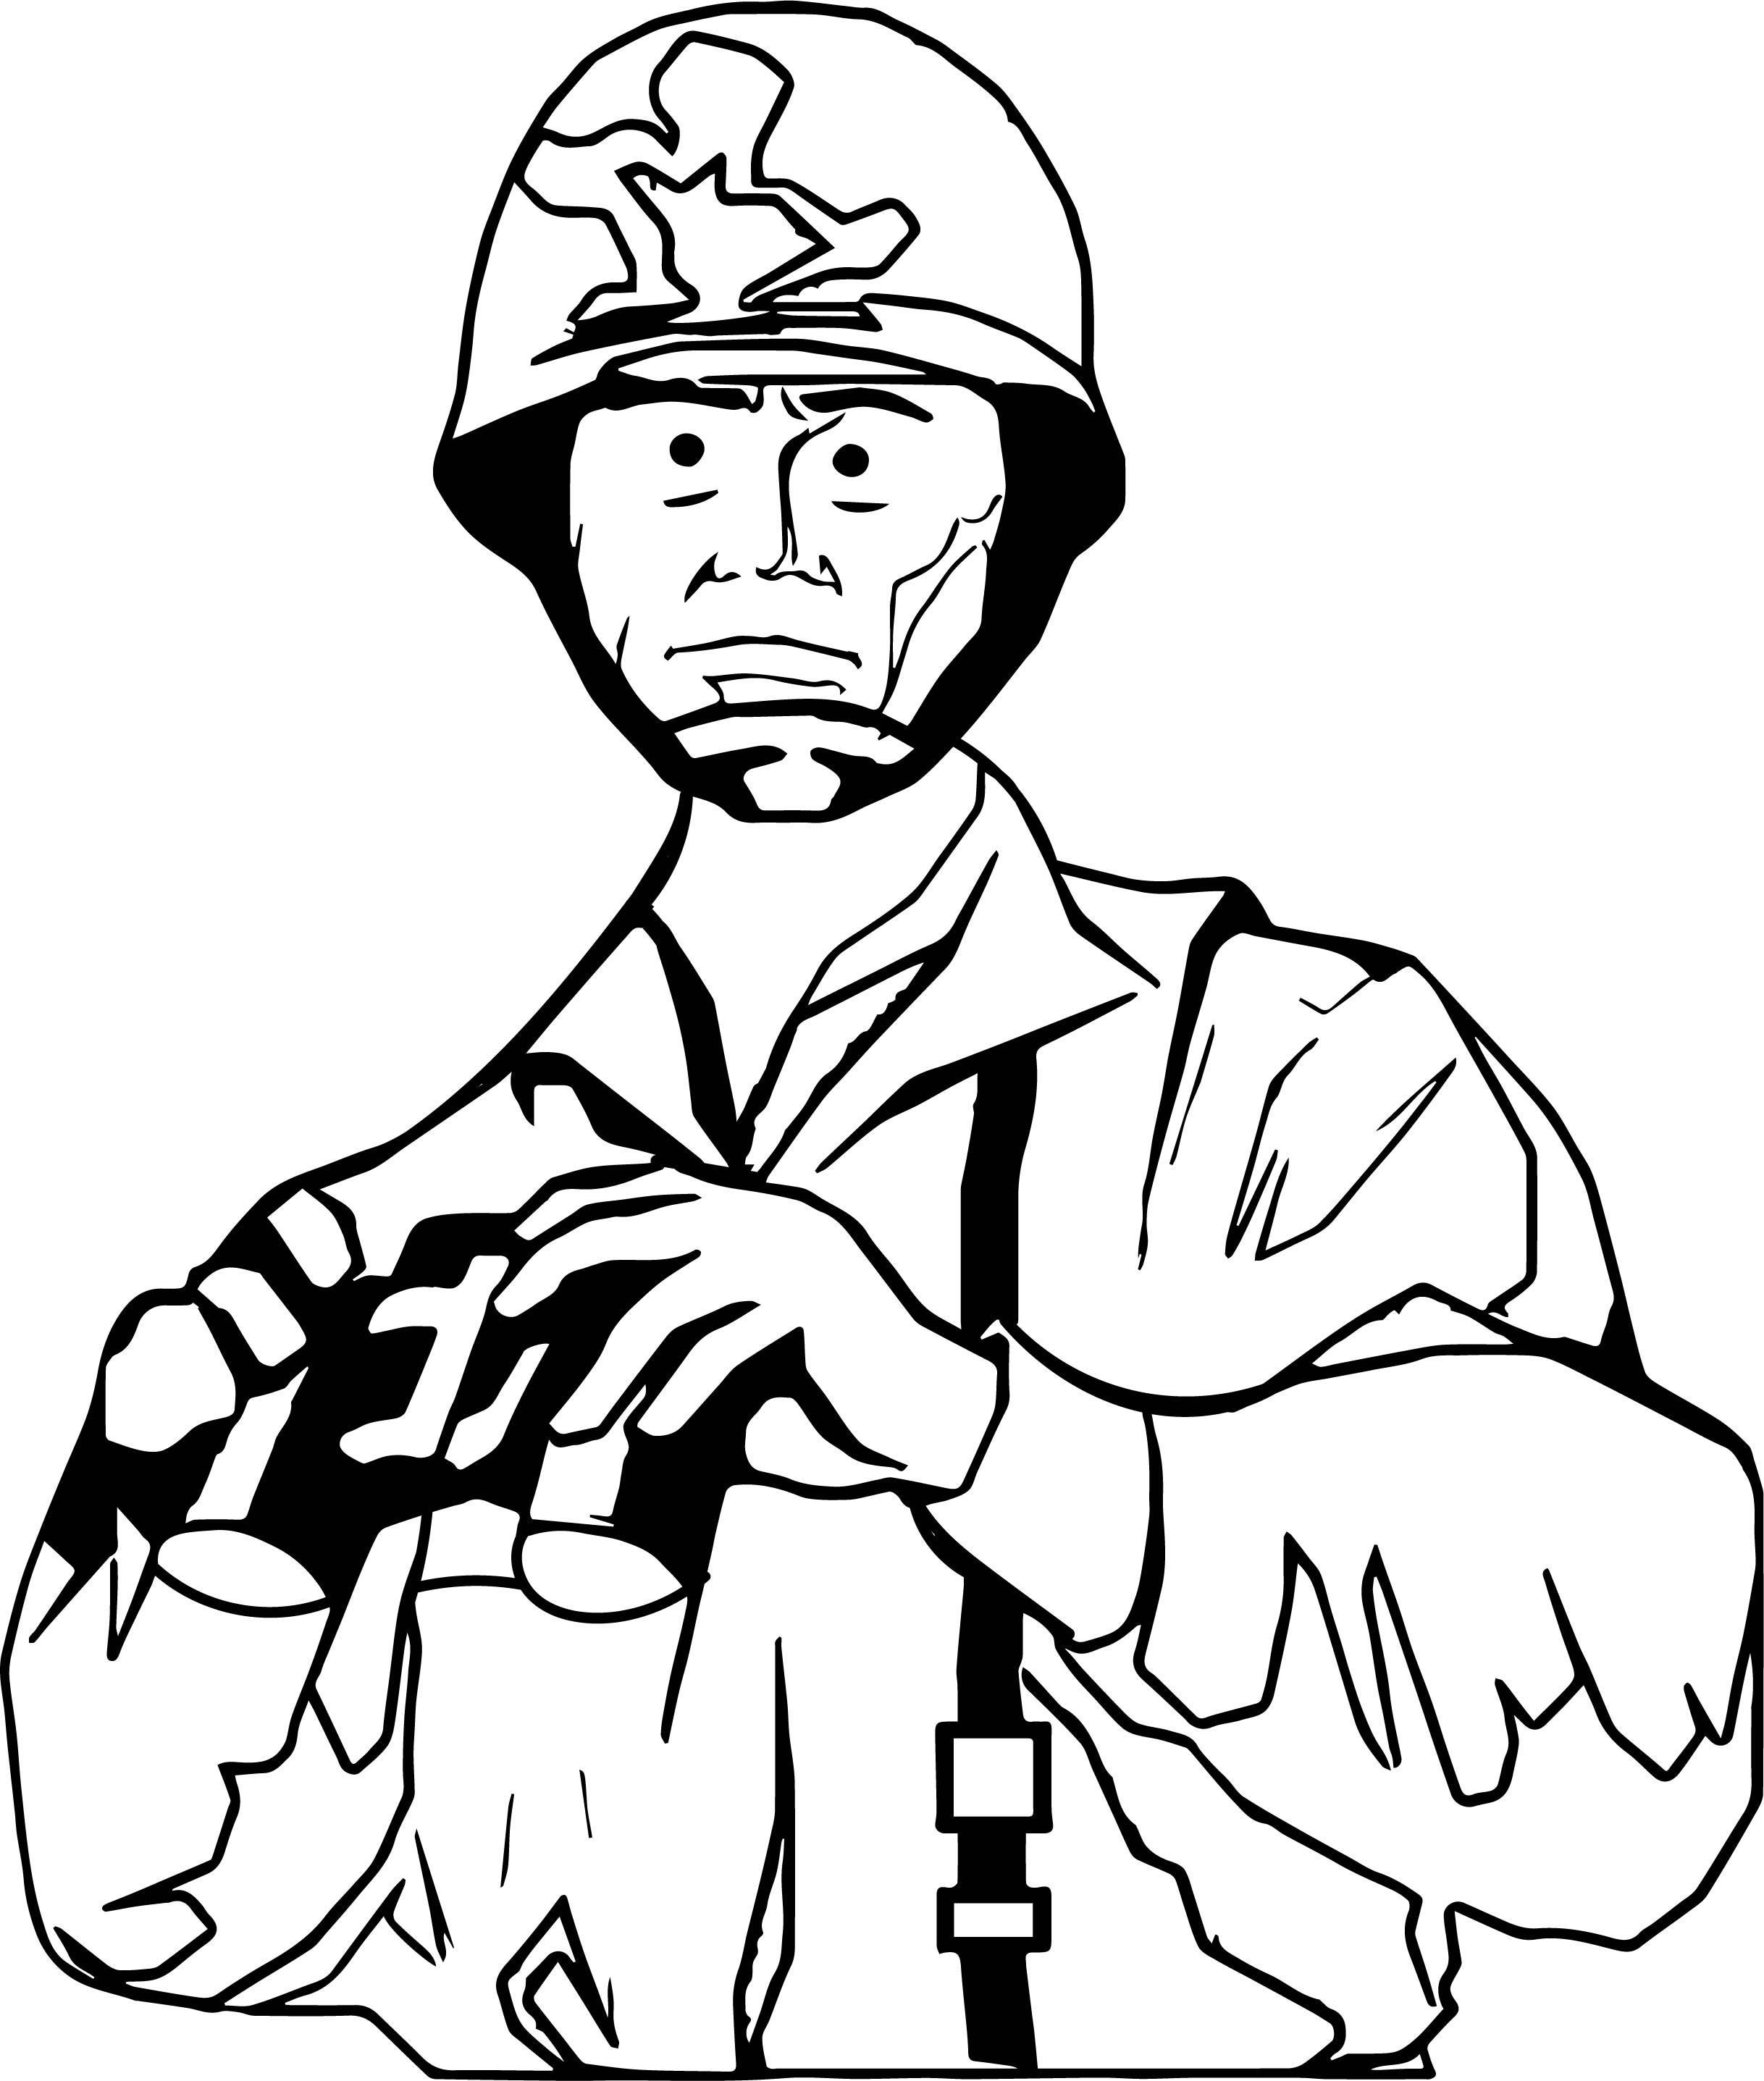 2436x2874 Soldier Commander Binoculars Coloring Page Wecoloringpage